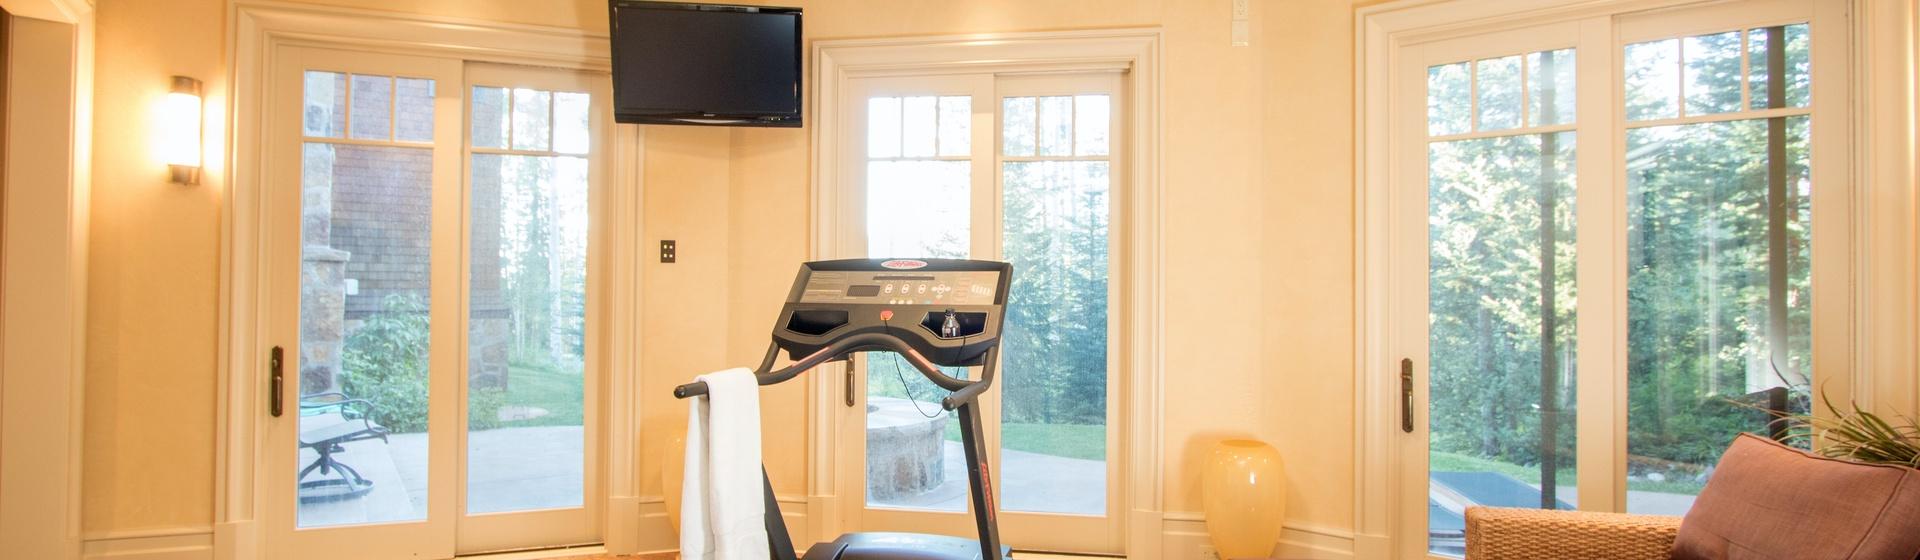 6.04-mountain-village-hood-park-manor-fitness-room-gym-track.JPG